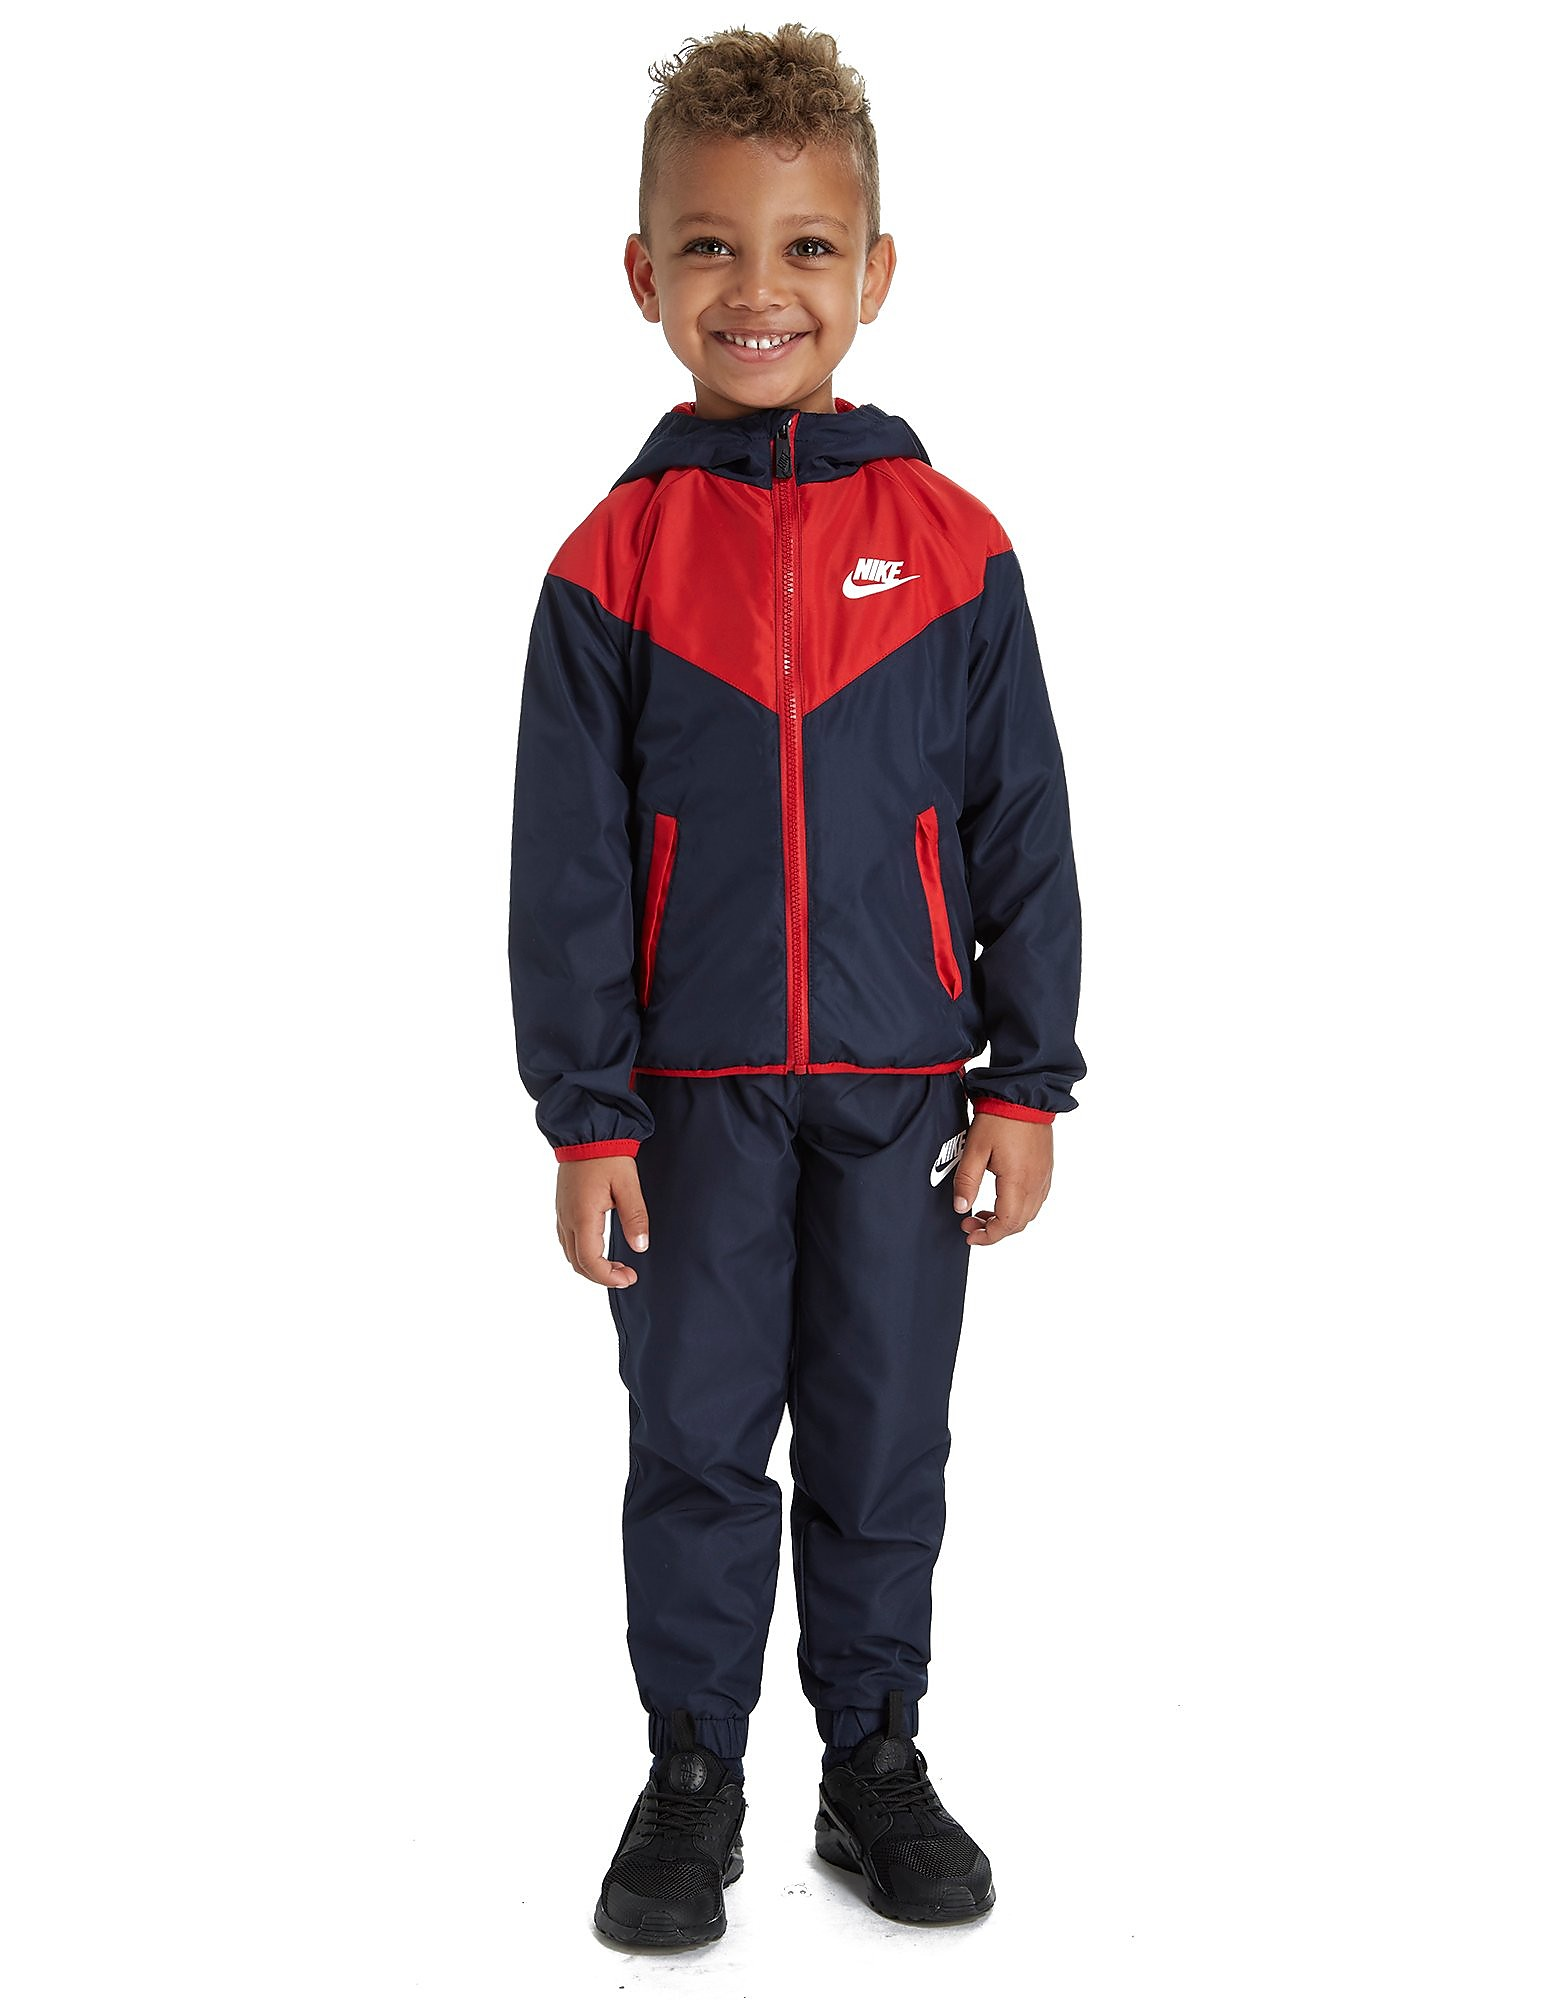 Nike Futura Tracksuit Children